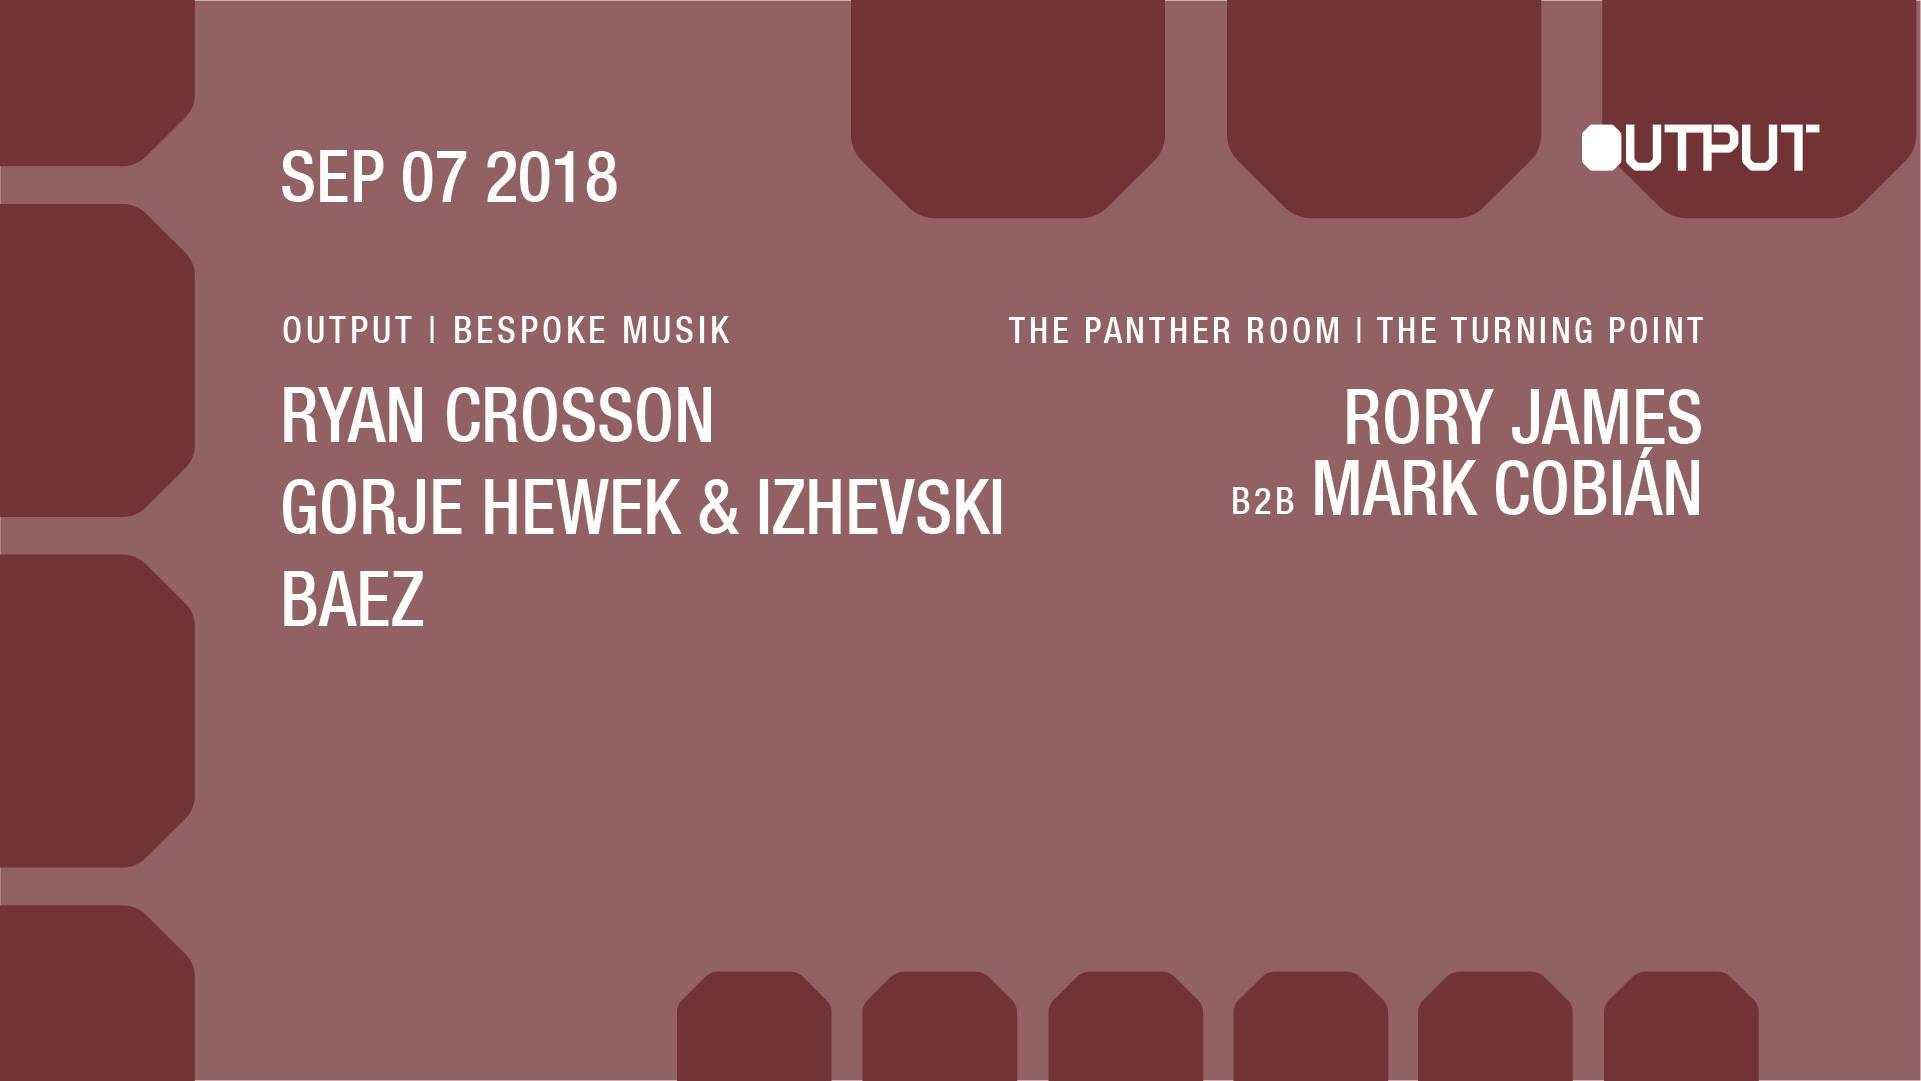 ryan crosson Gorje Hewek & Izhevski Baez Output Club BK Guest List Robbie Lumpkin Promotions